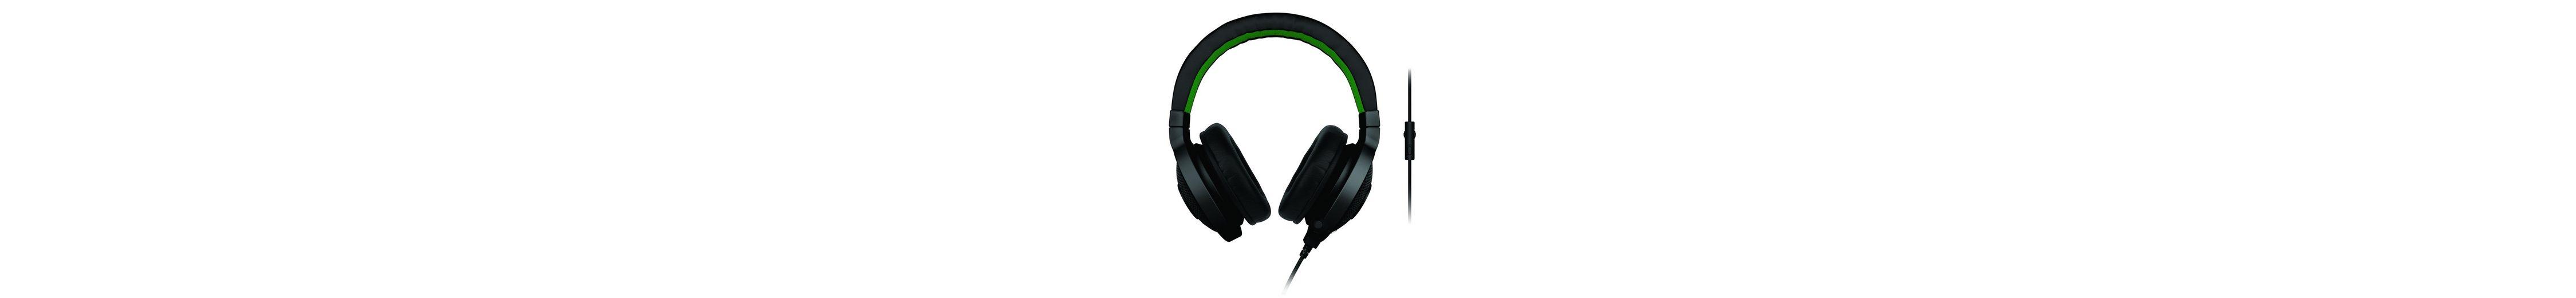 RAZER Gaming-Headset »Kraken Pro 2015«